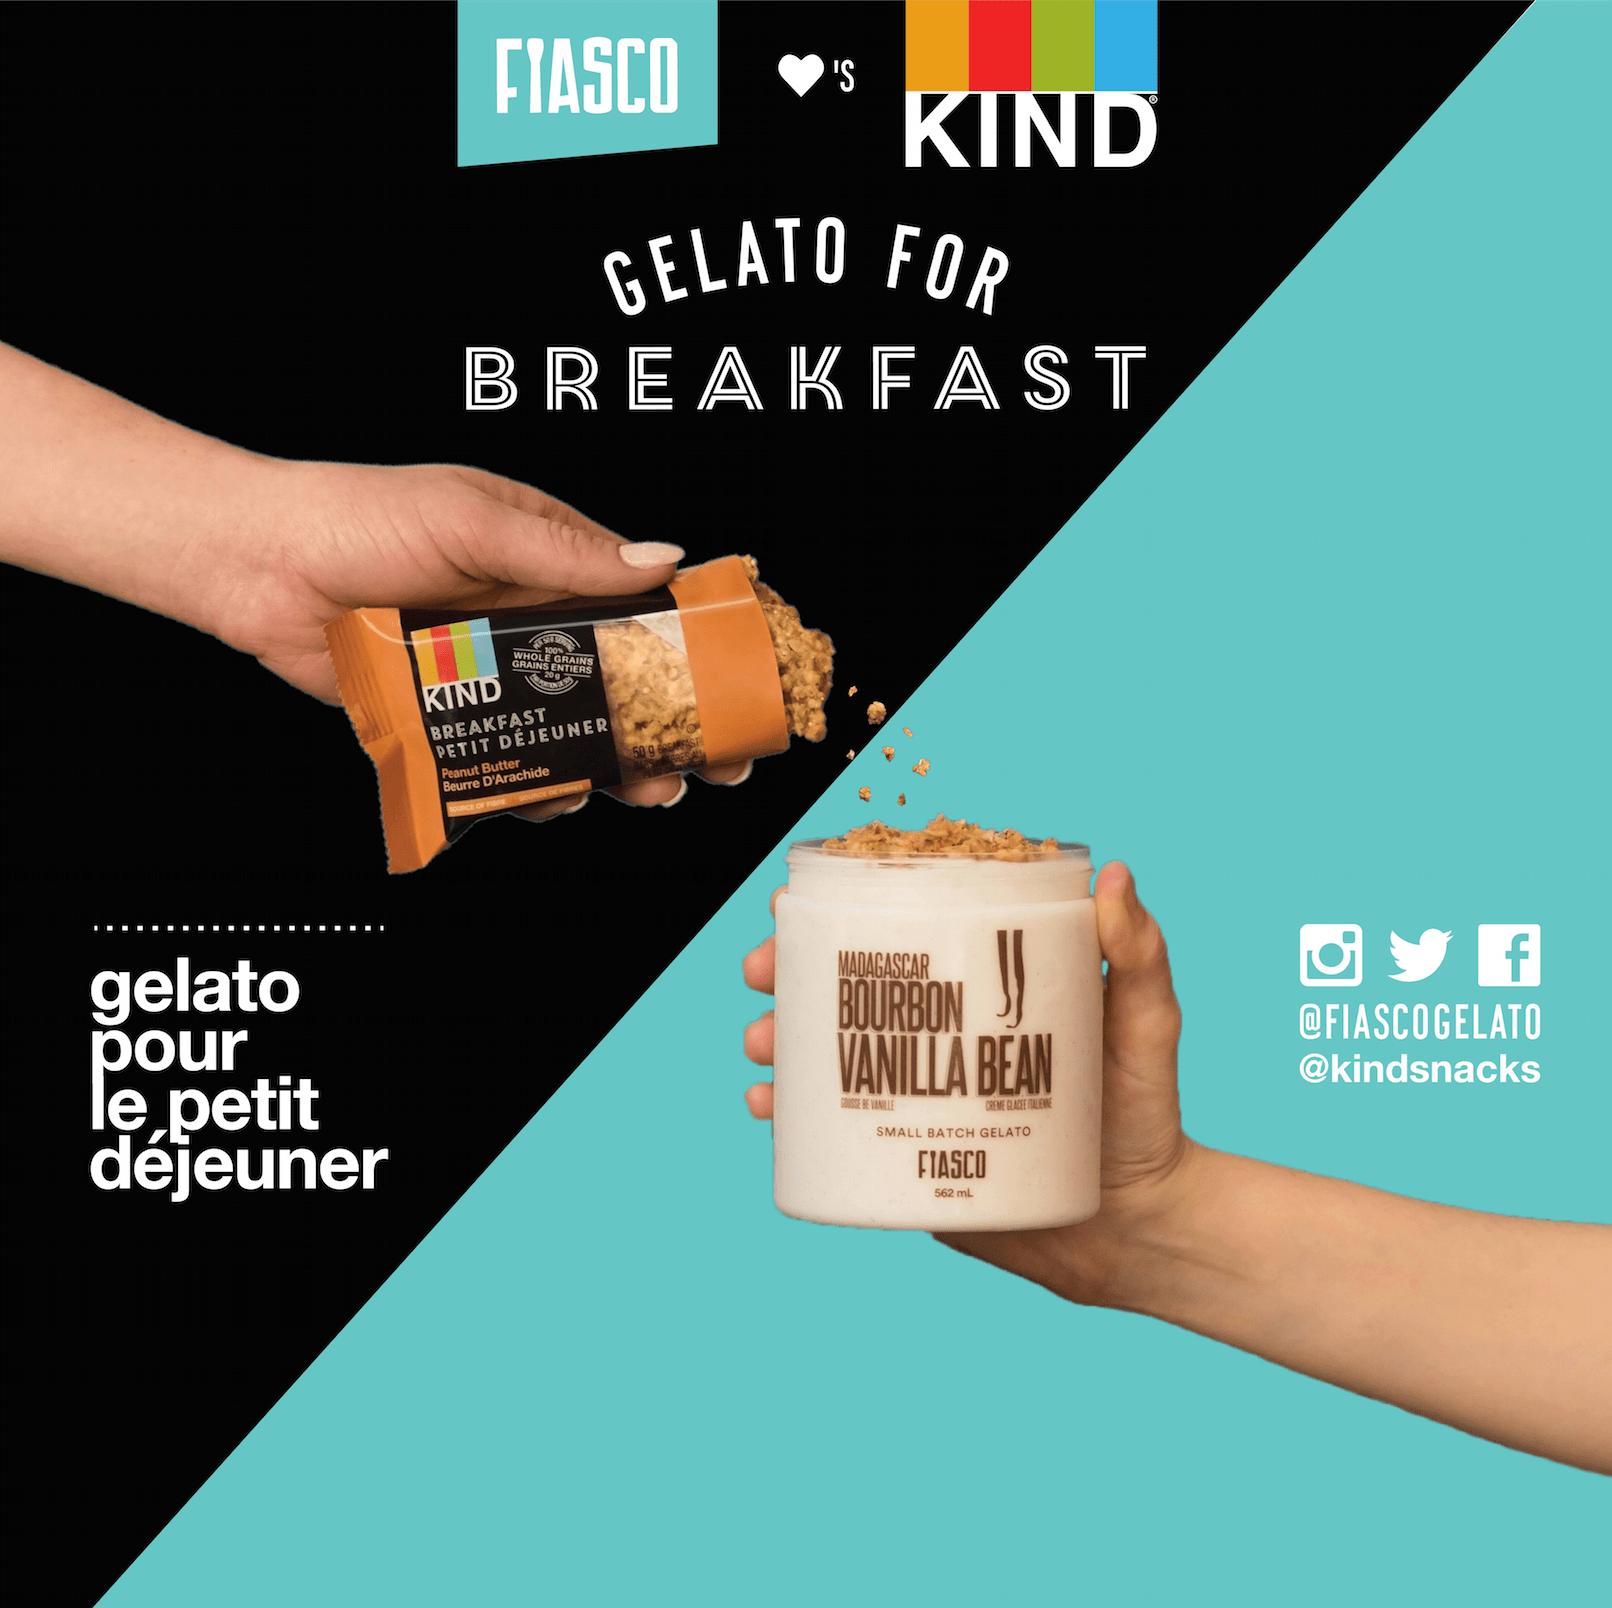 FIASCO X KIND - GELATO FOR BREAKFAST